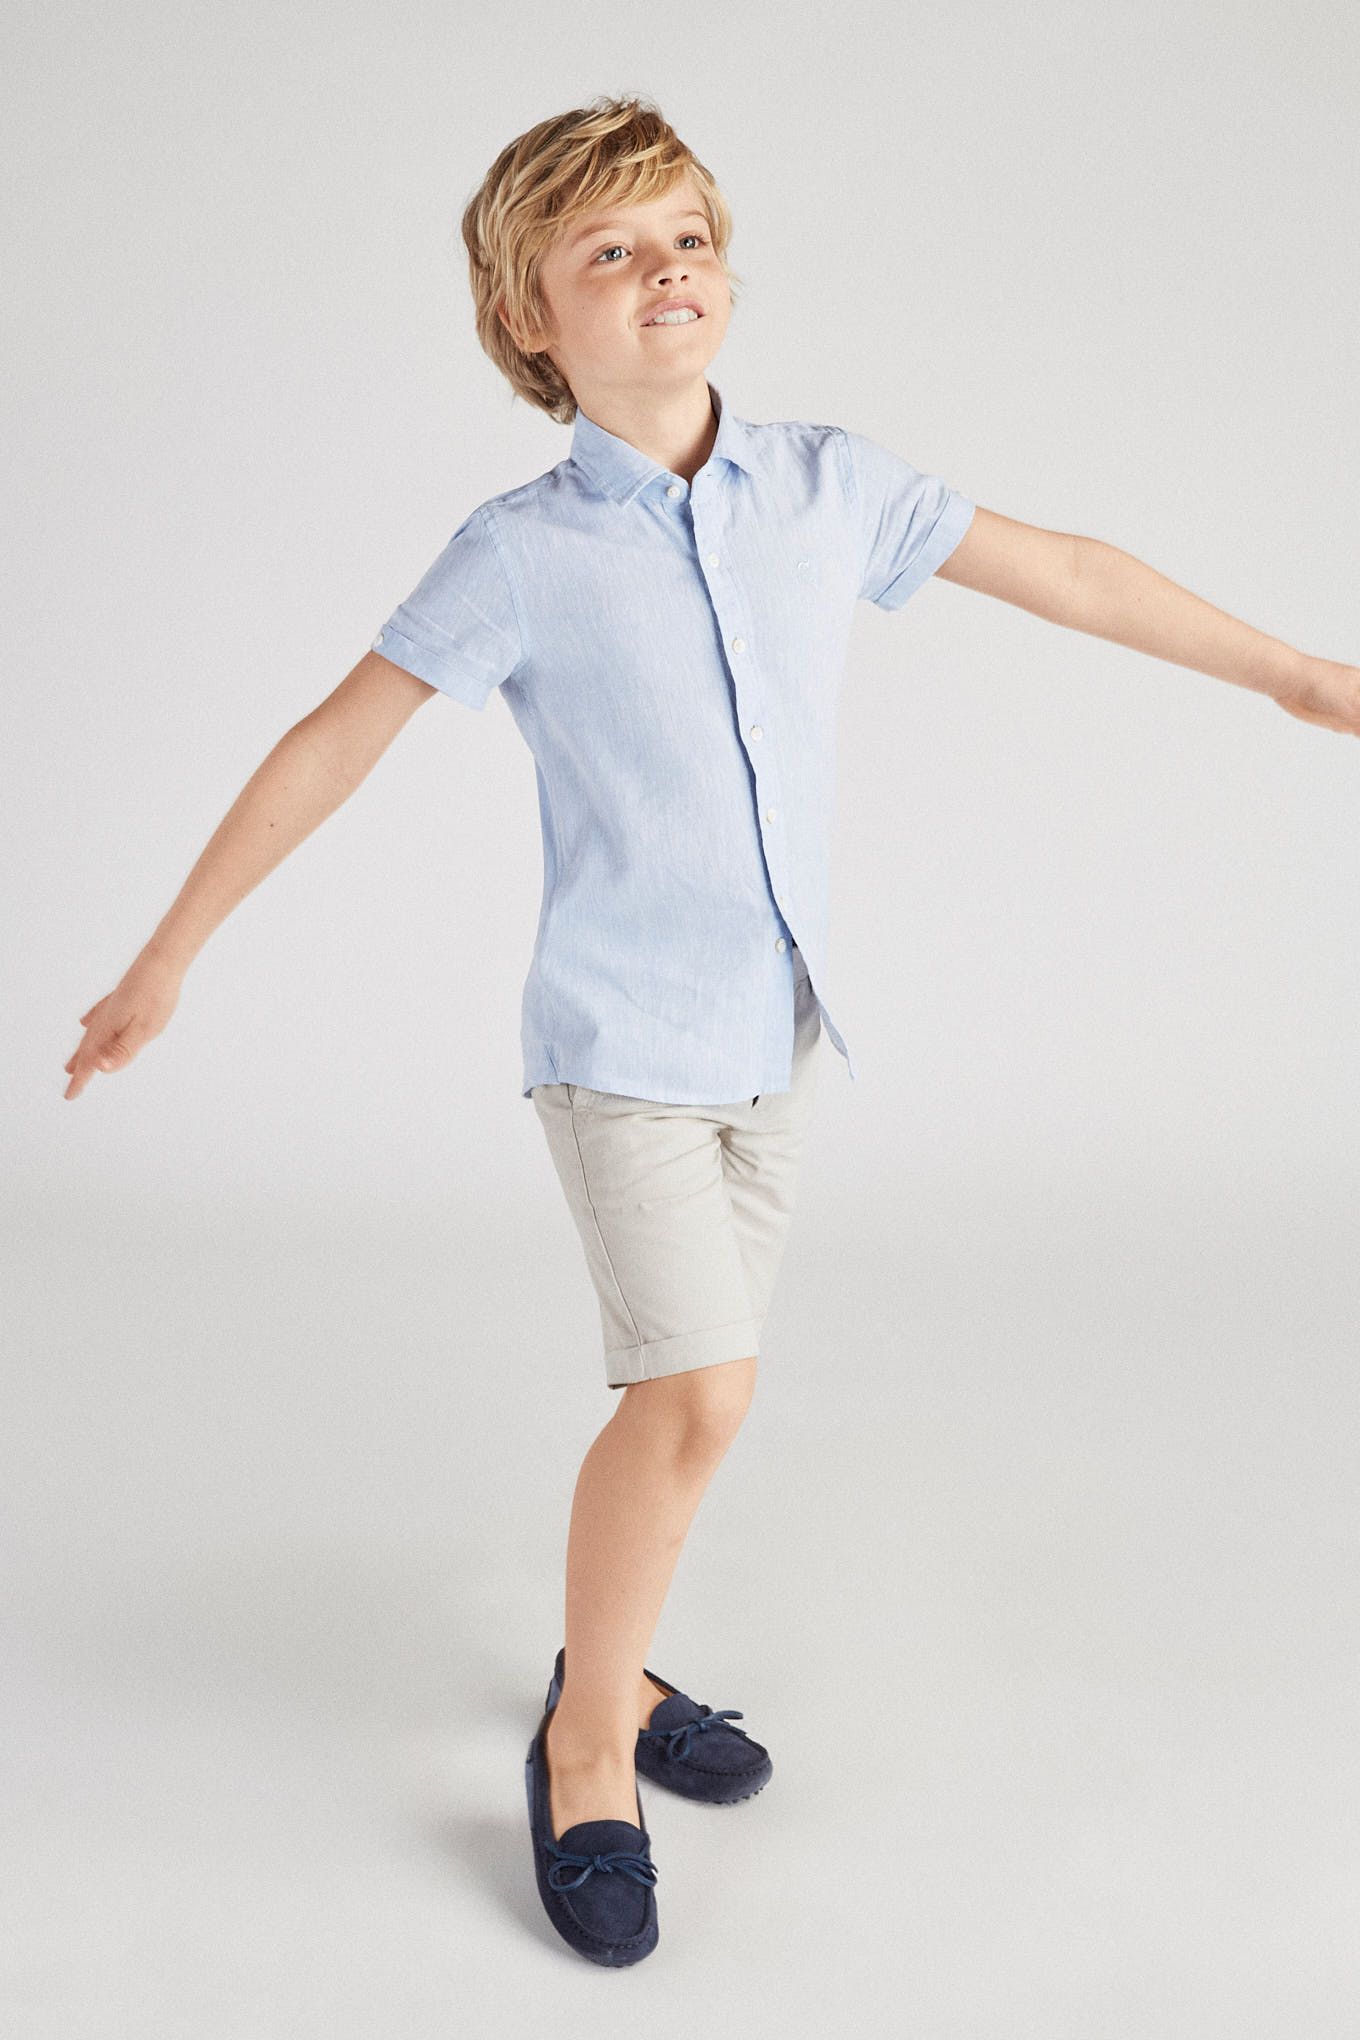 Bermuda Sand Casual Boy